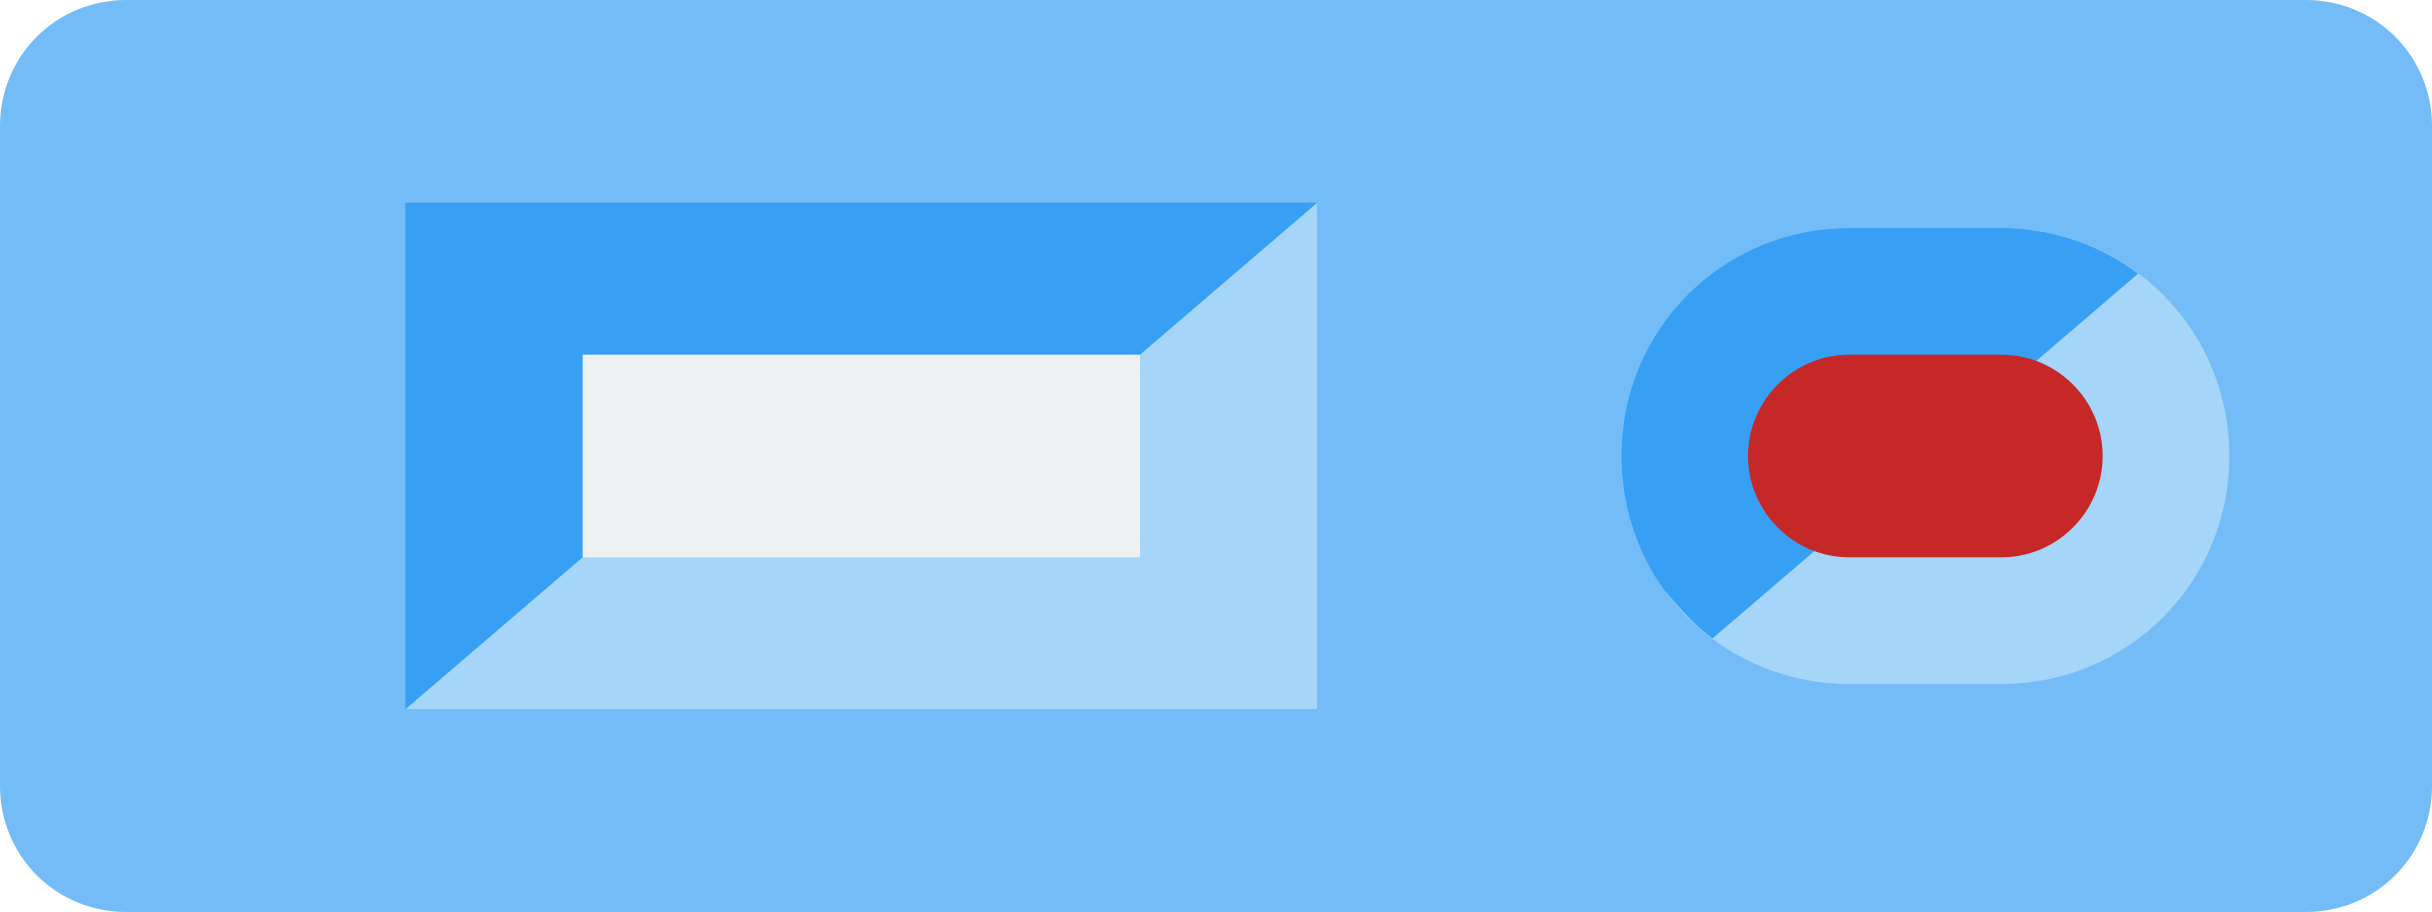 express test Clipart illustration in PNG, SVG